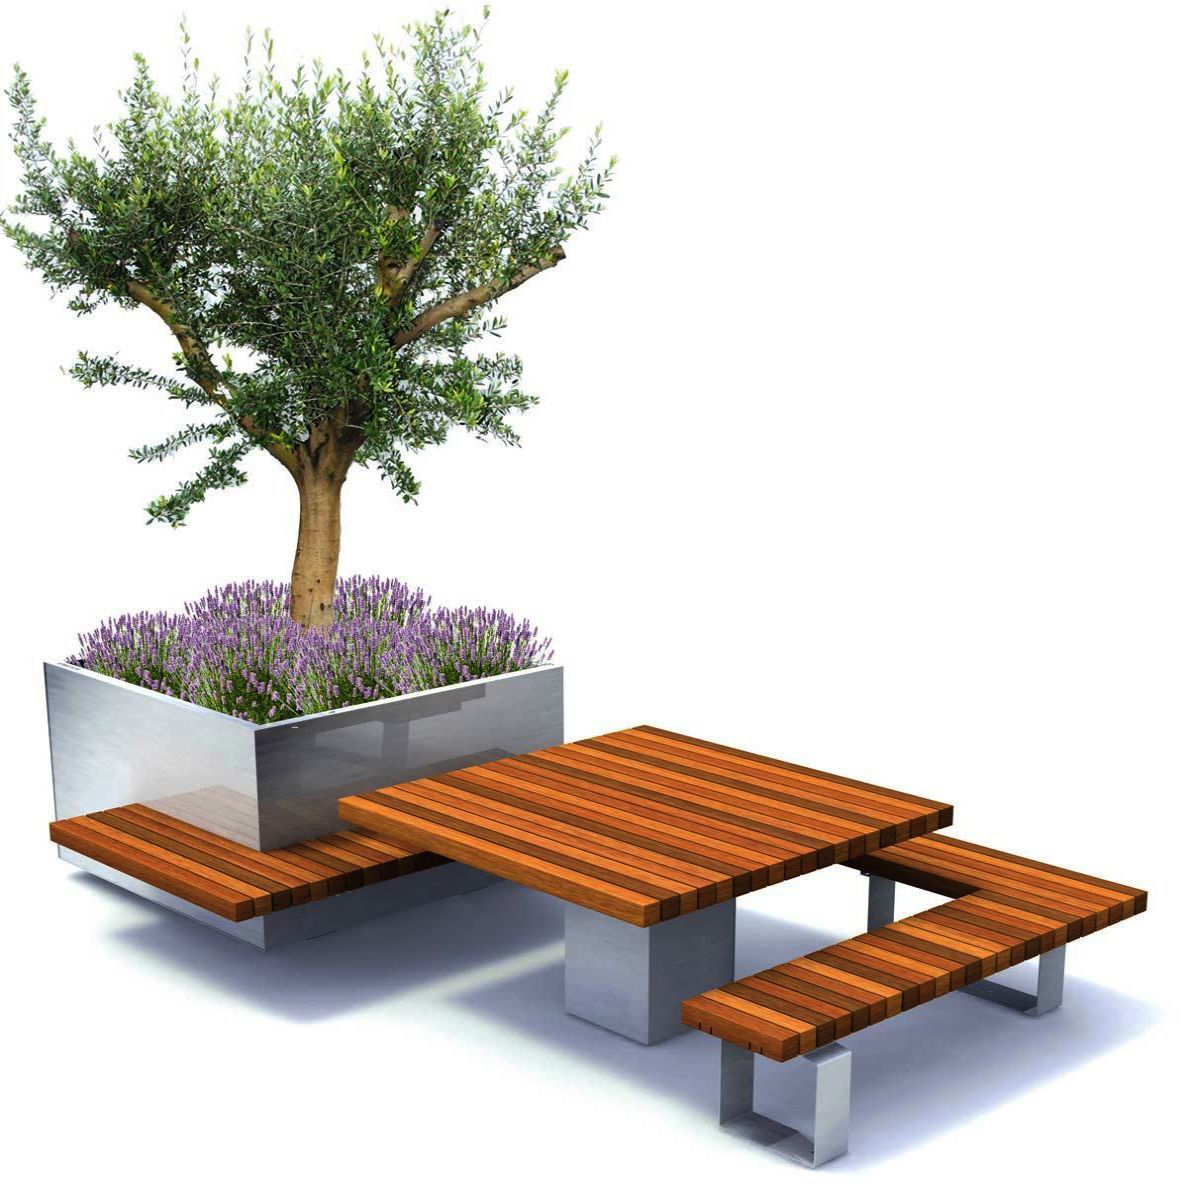 Choosing Plants That Will Not Harm Children | Landscape ...